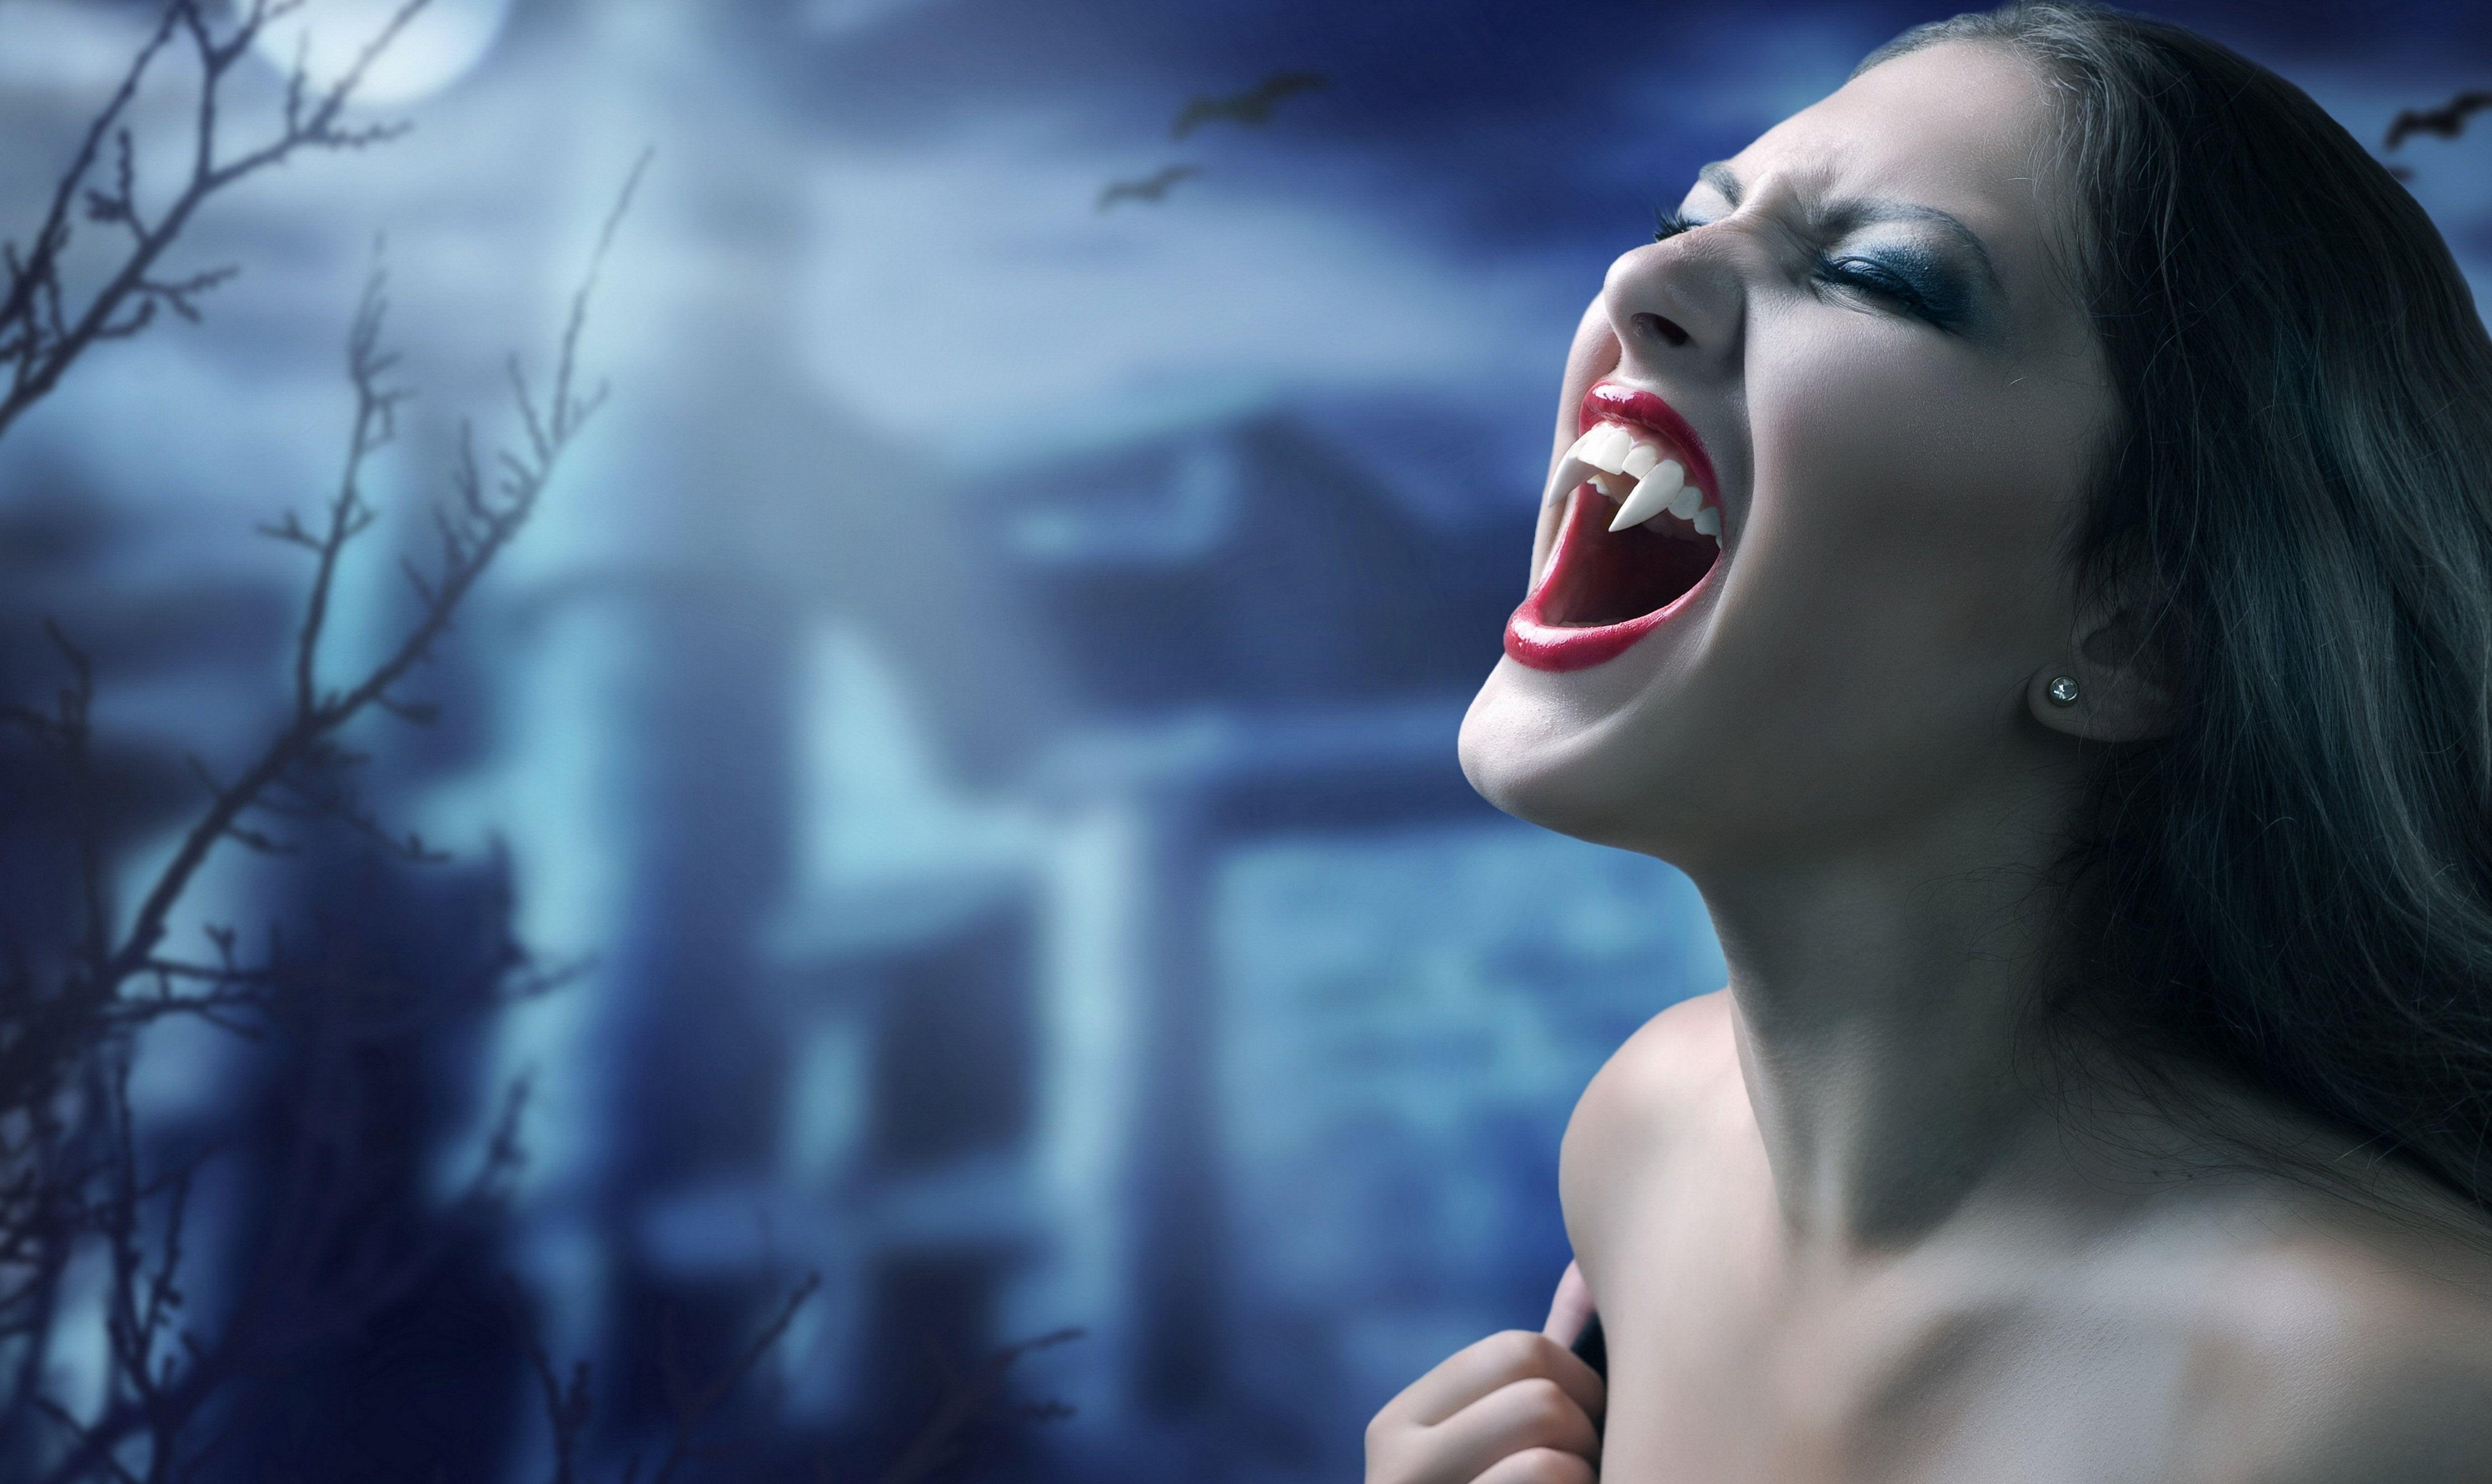 vampire- the blood sucking demon.